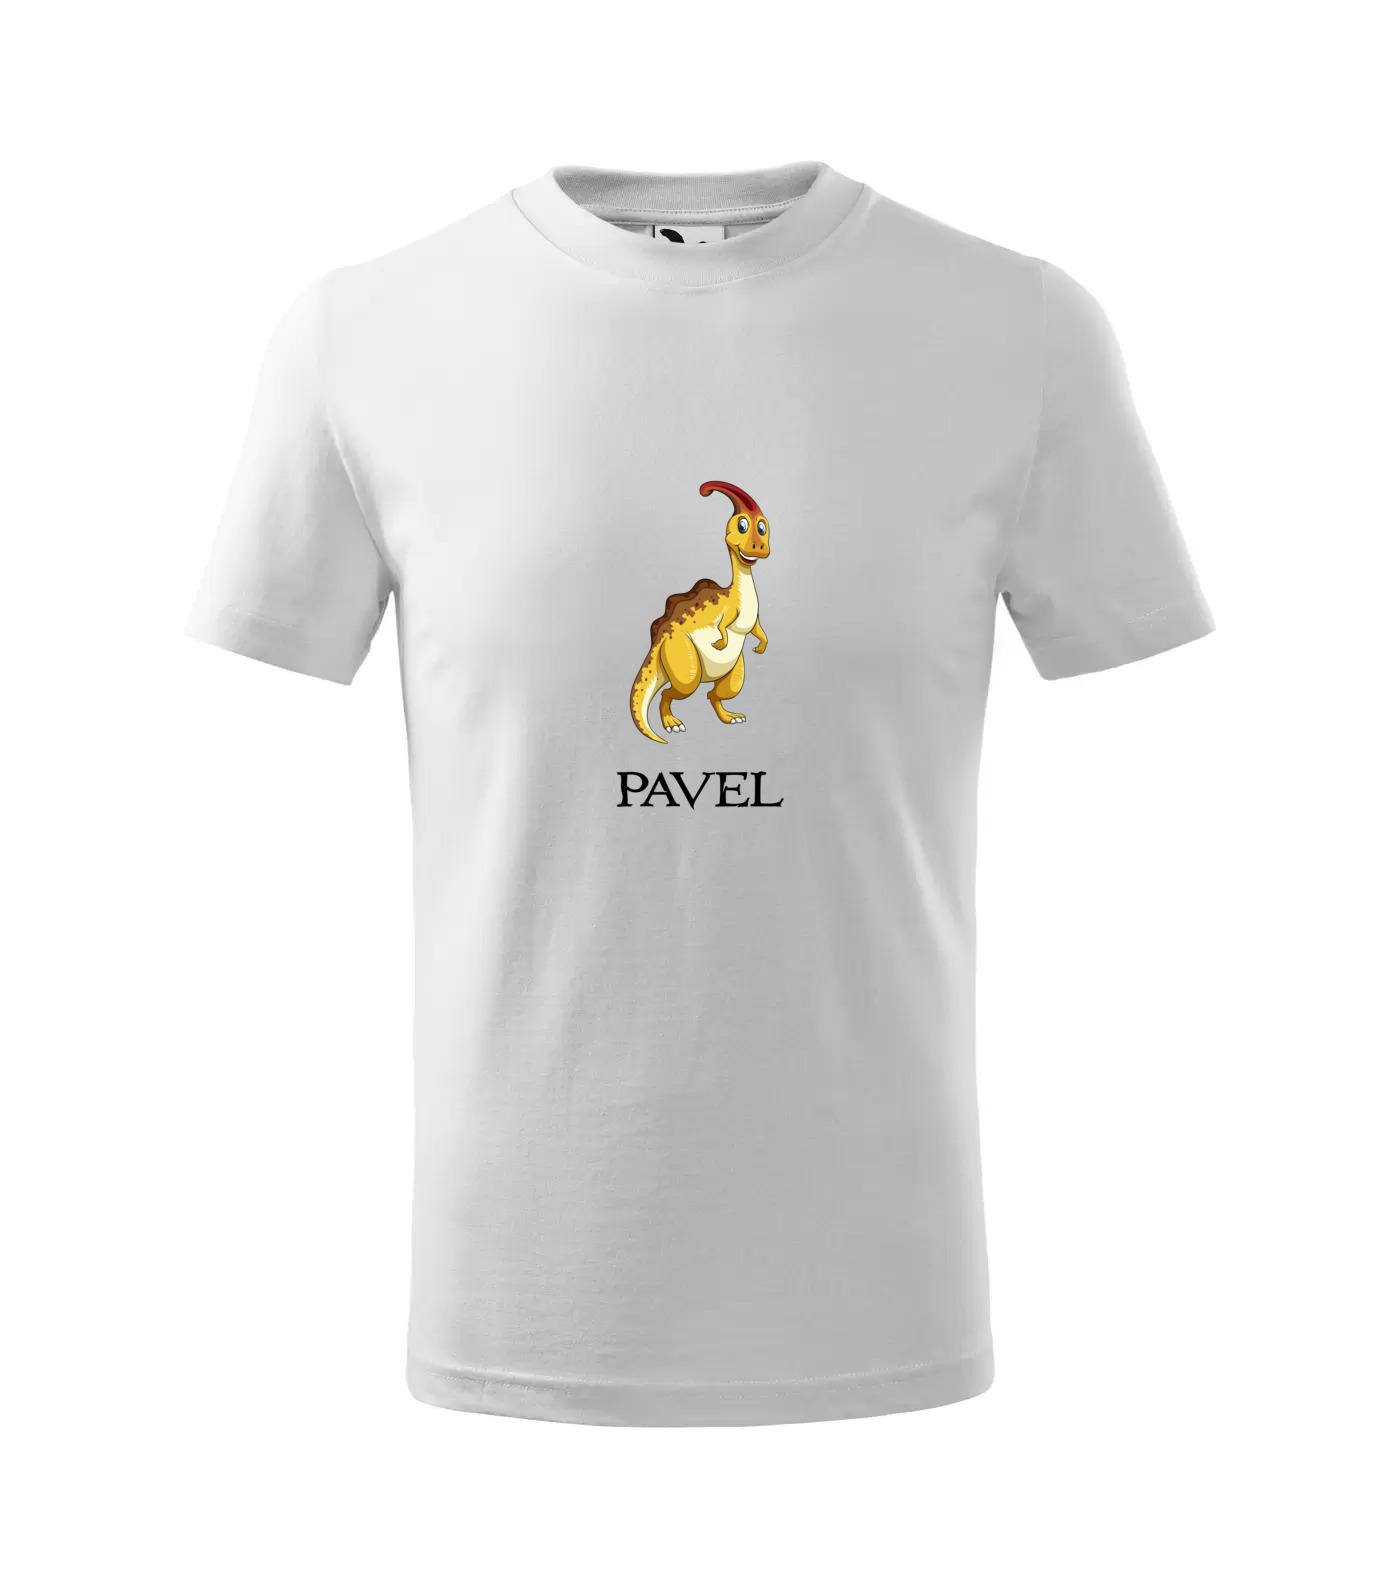 Tričko Dinosaurus Pavel